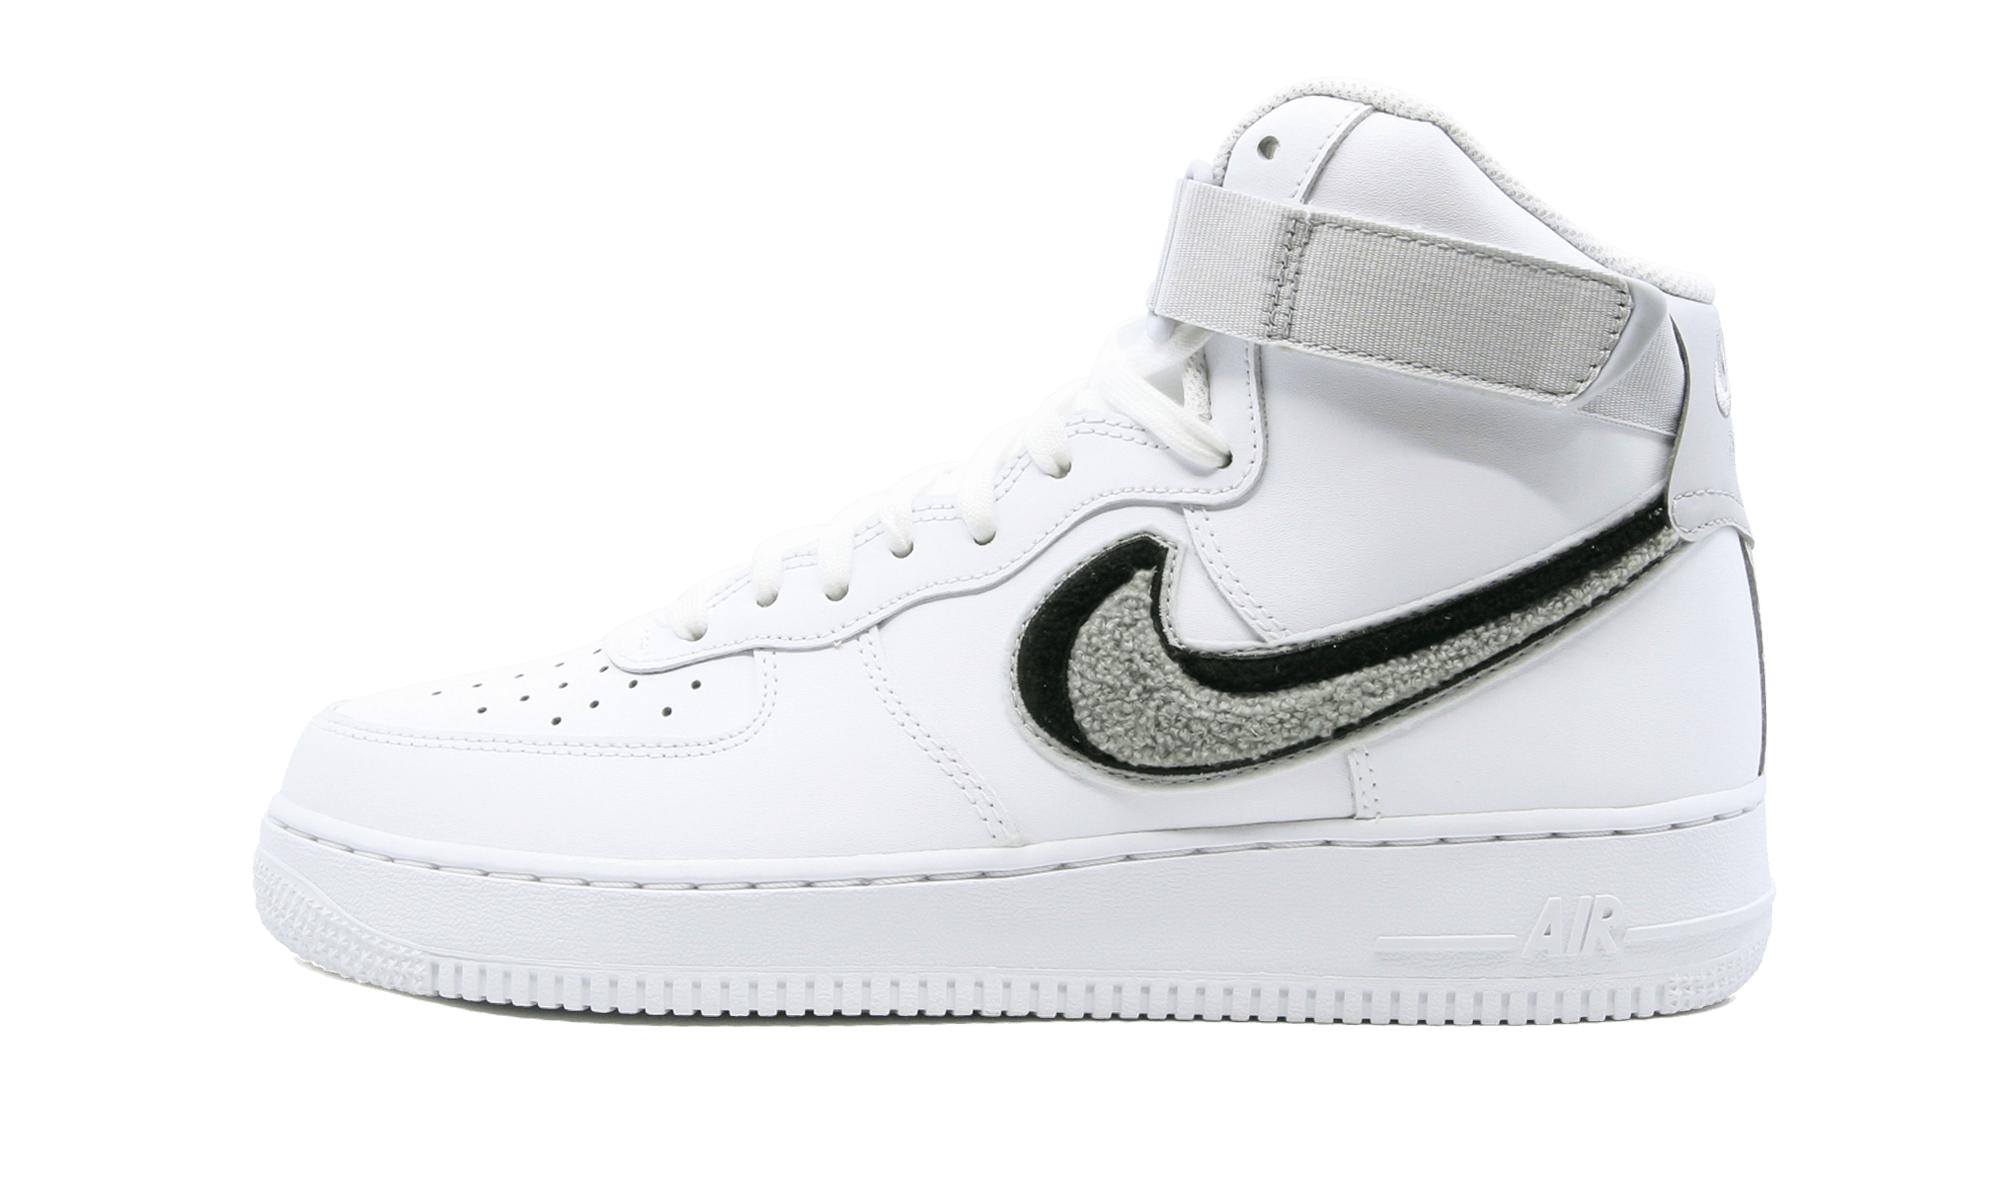 Nike. Men s White Air Force 1 High 07 Lv8. £83 From Stadium Goods b85cec407